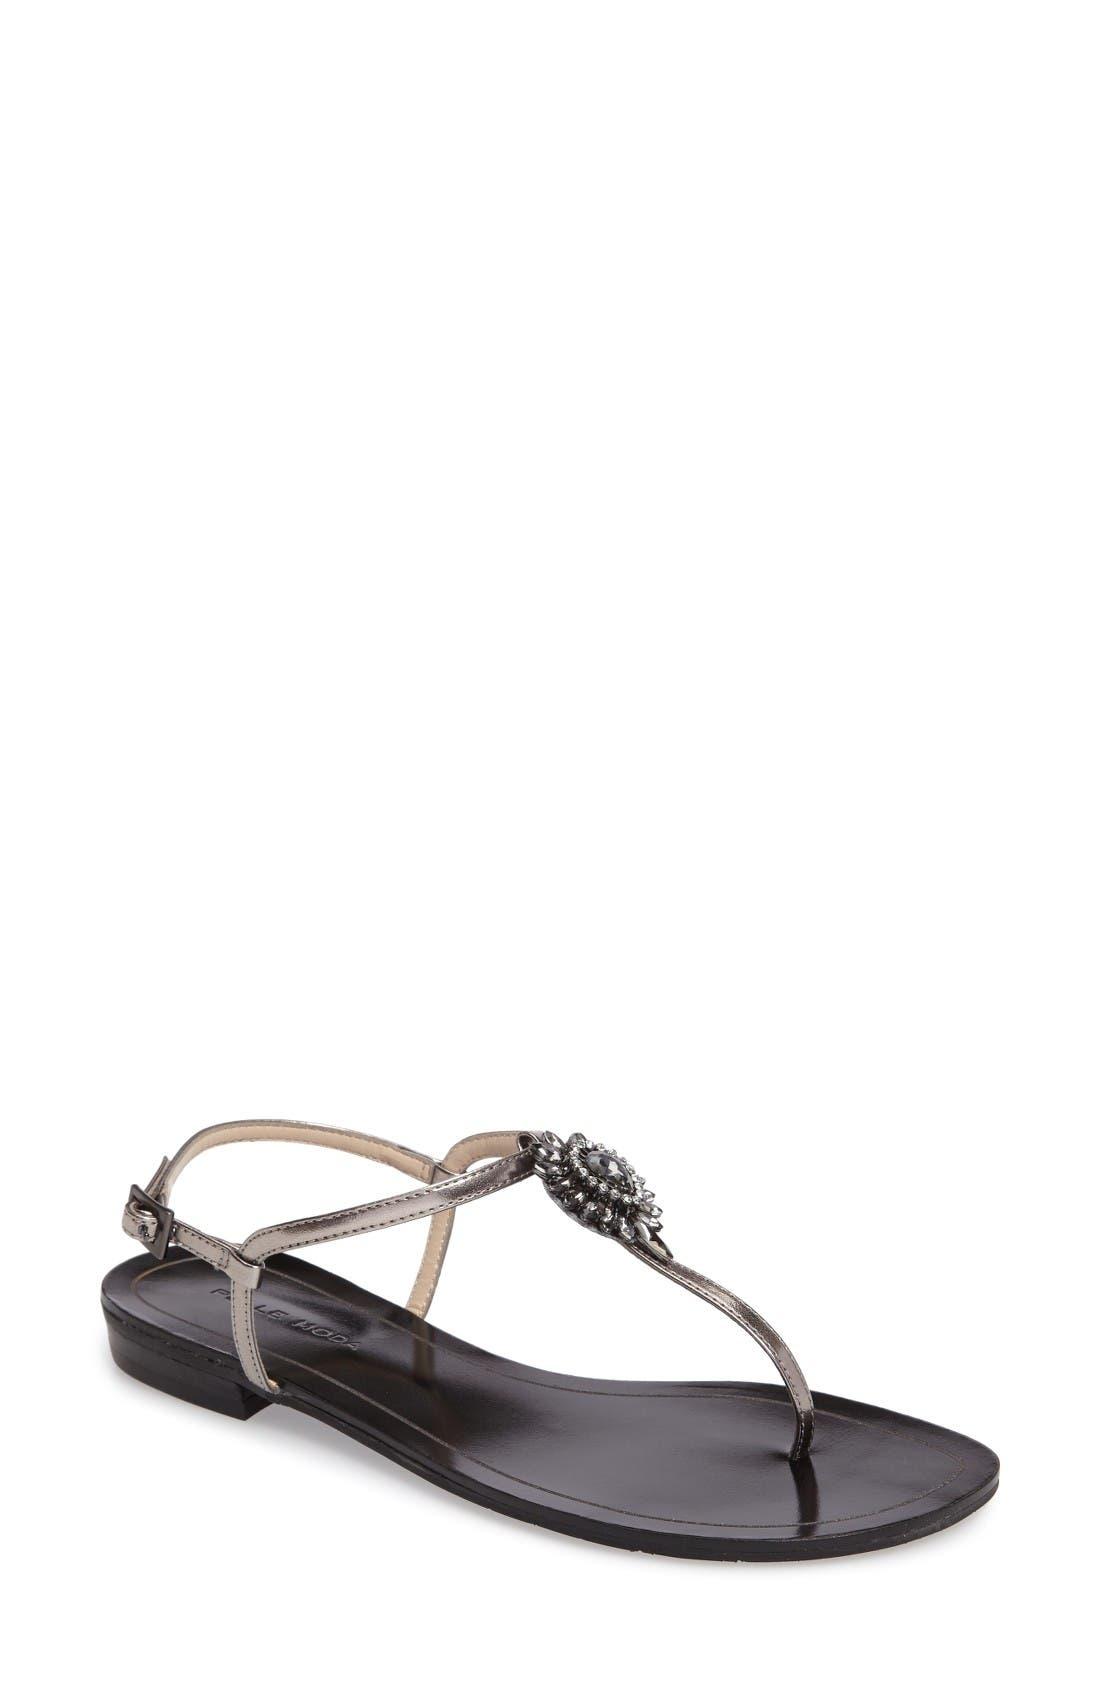 Main Image - Pelle Moda Baxley 3 Crystal Embellished Sandal (Women)